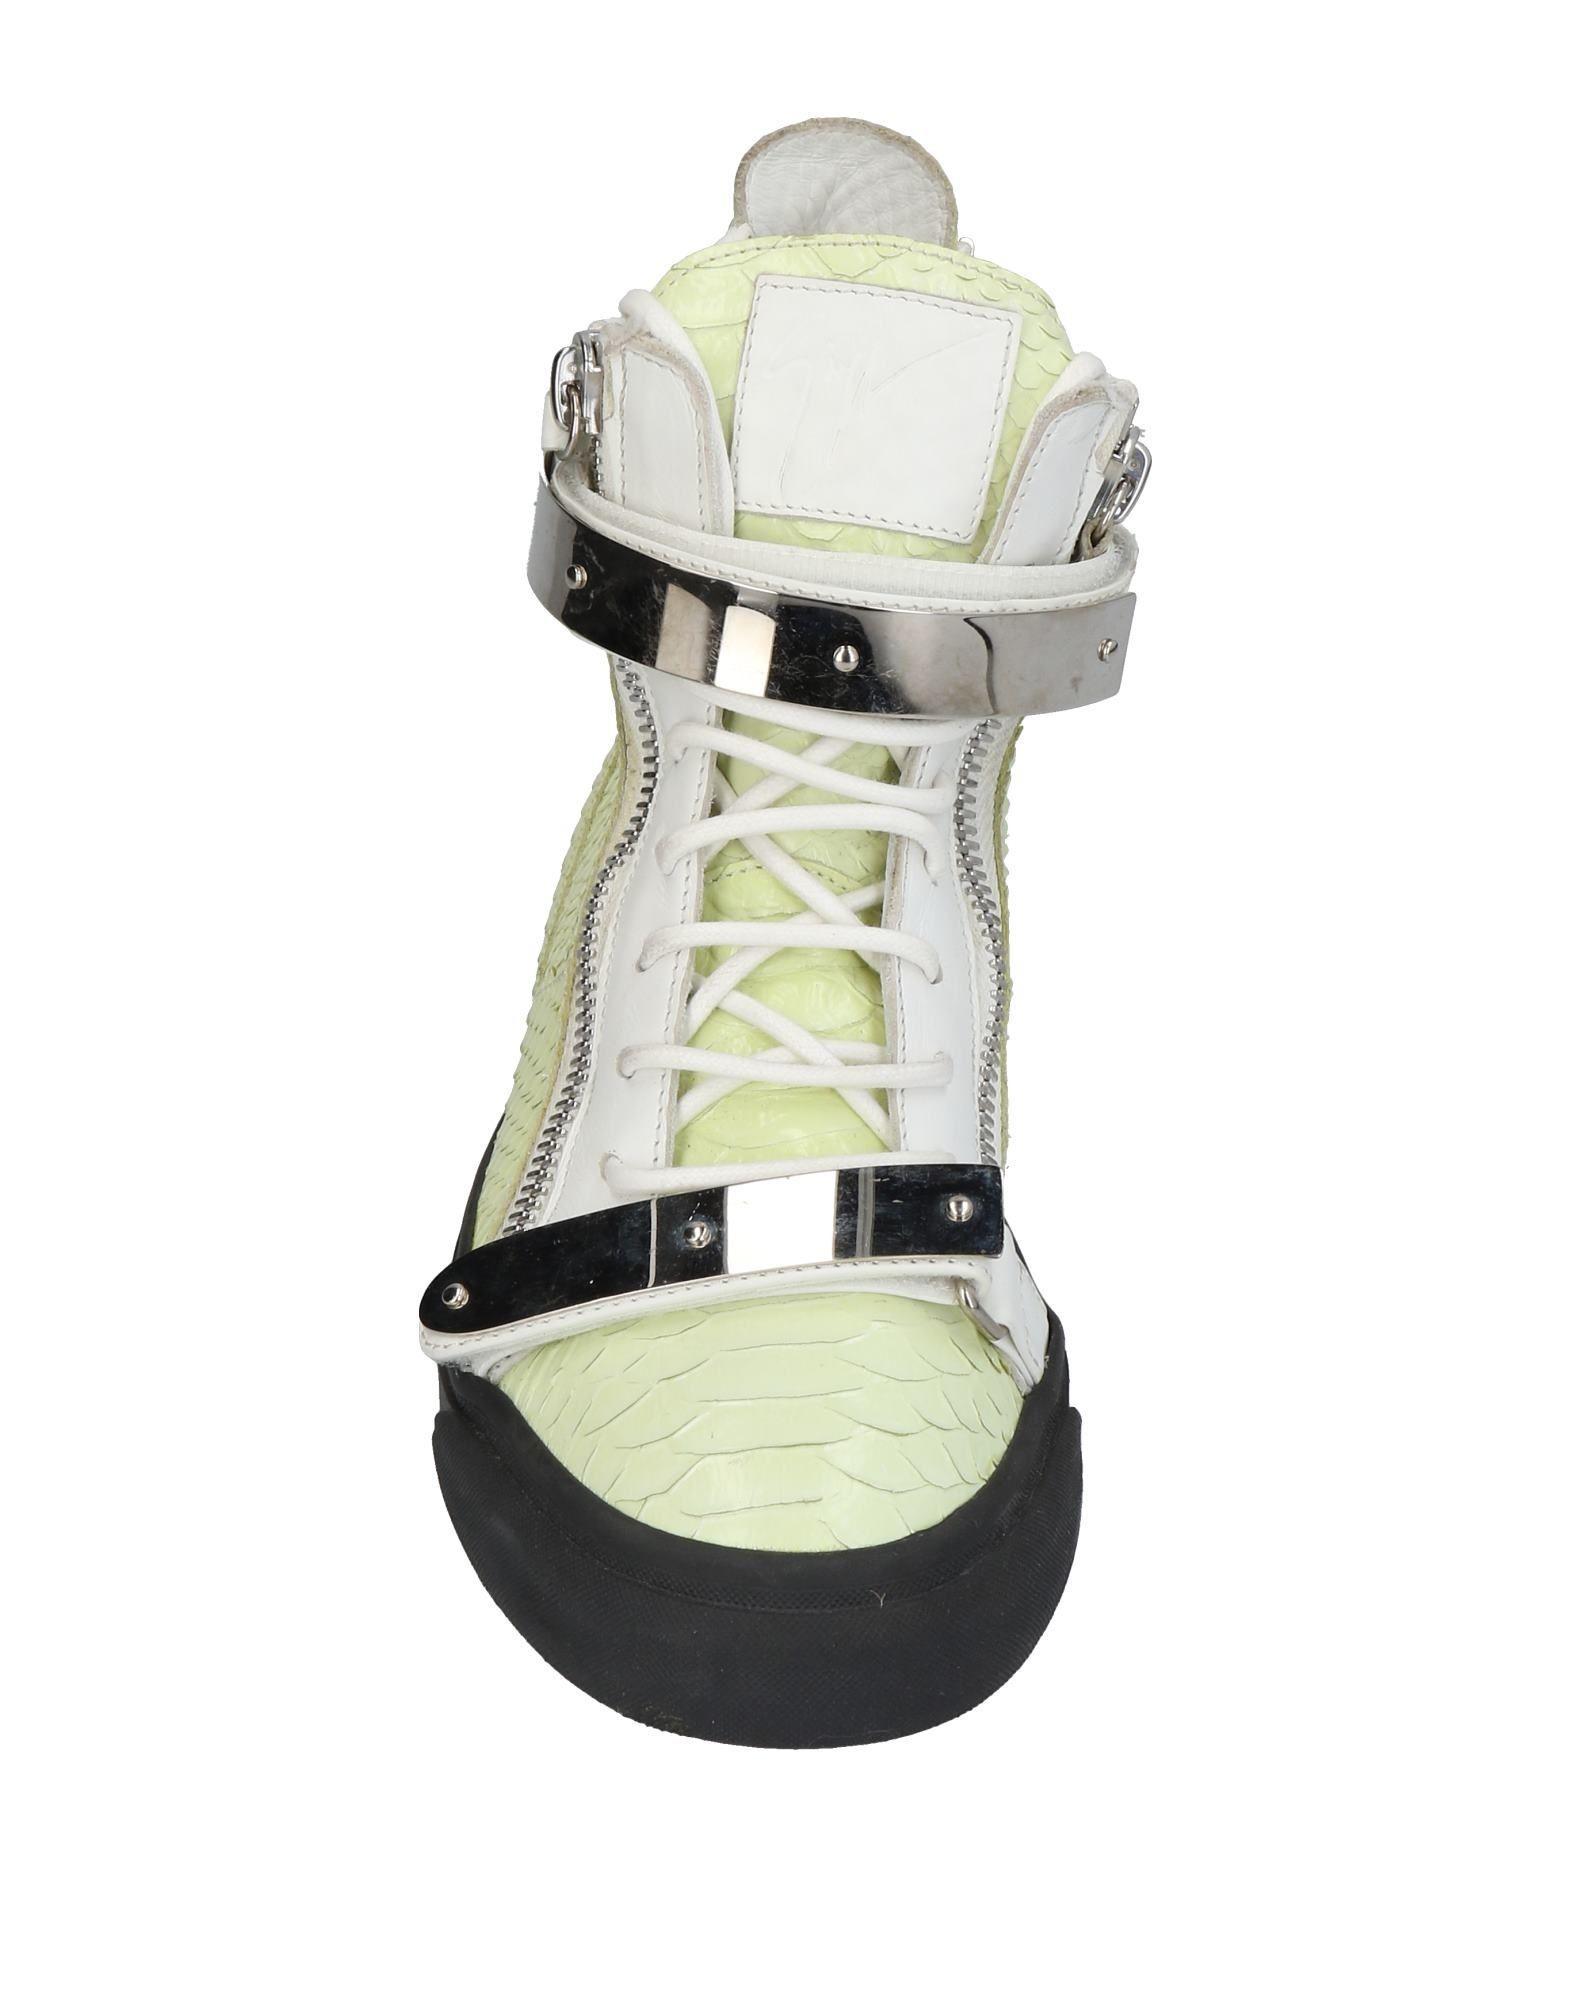 Giuseppe Zanotti Leather High-tops & Sneakers in Light Green (Green)